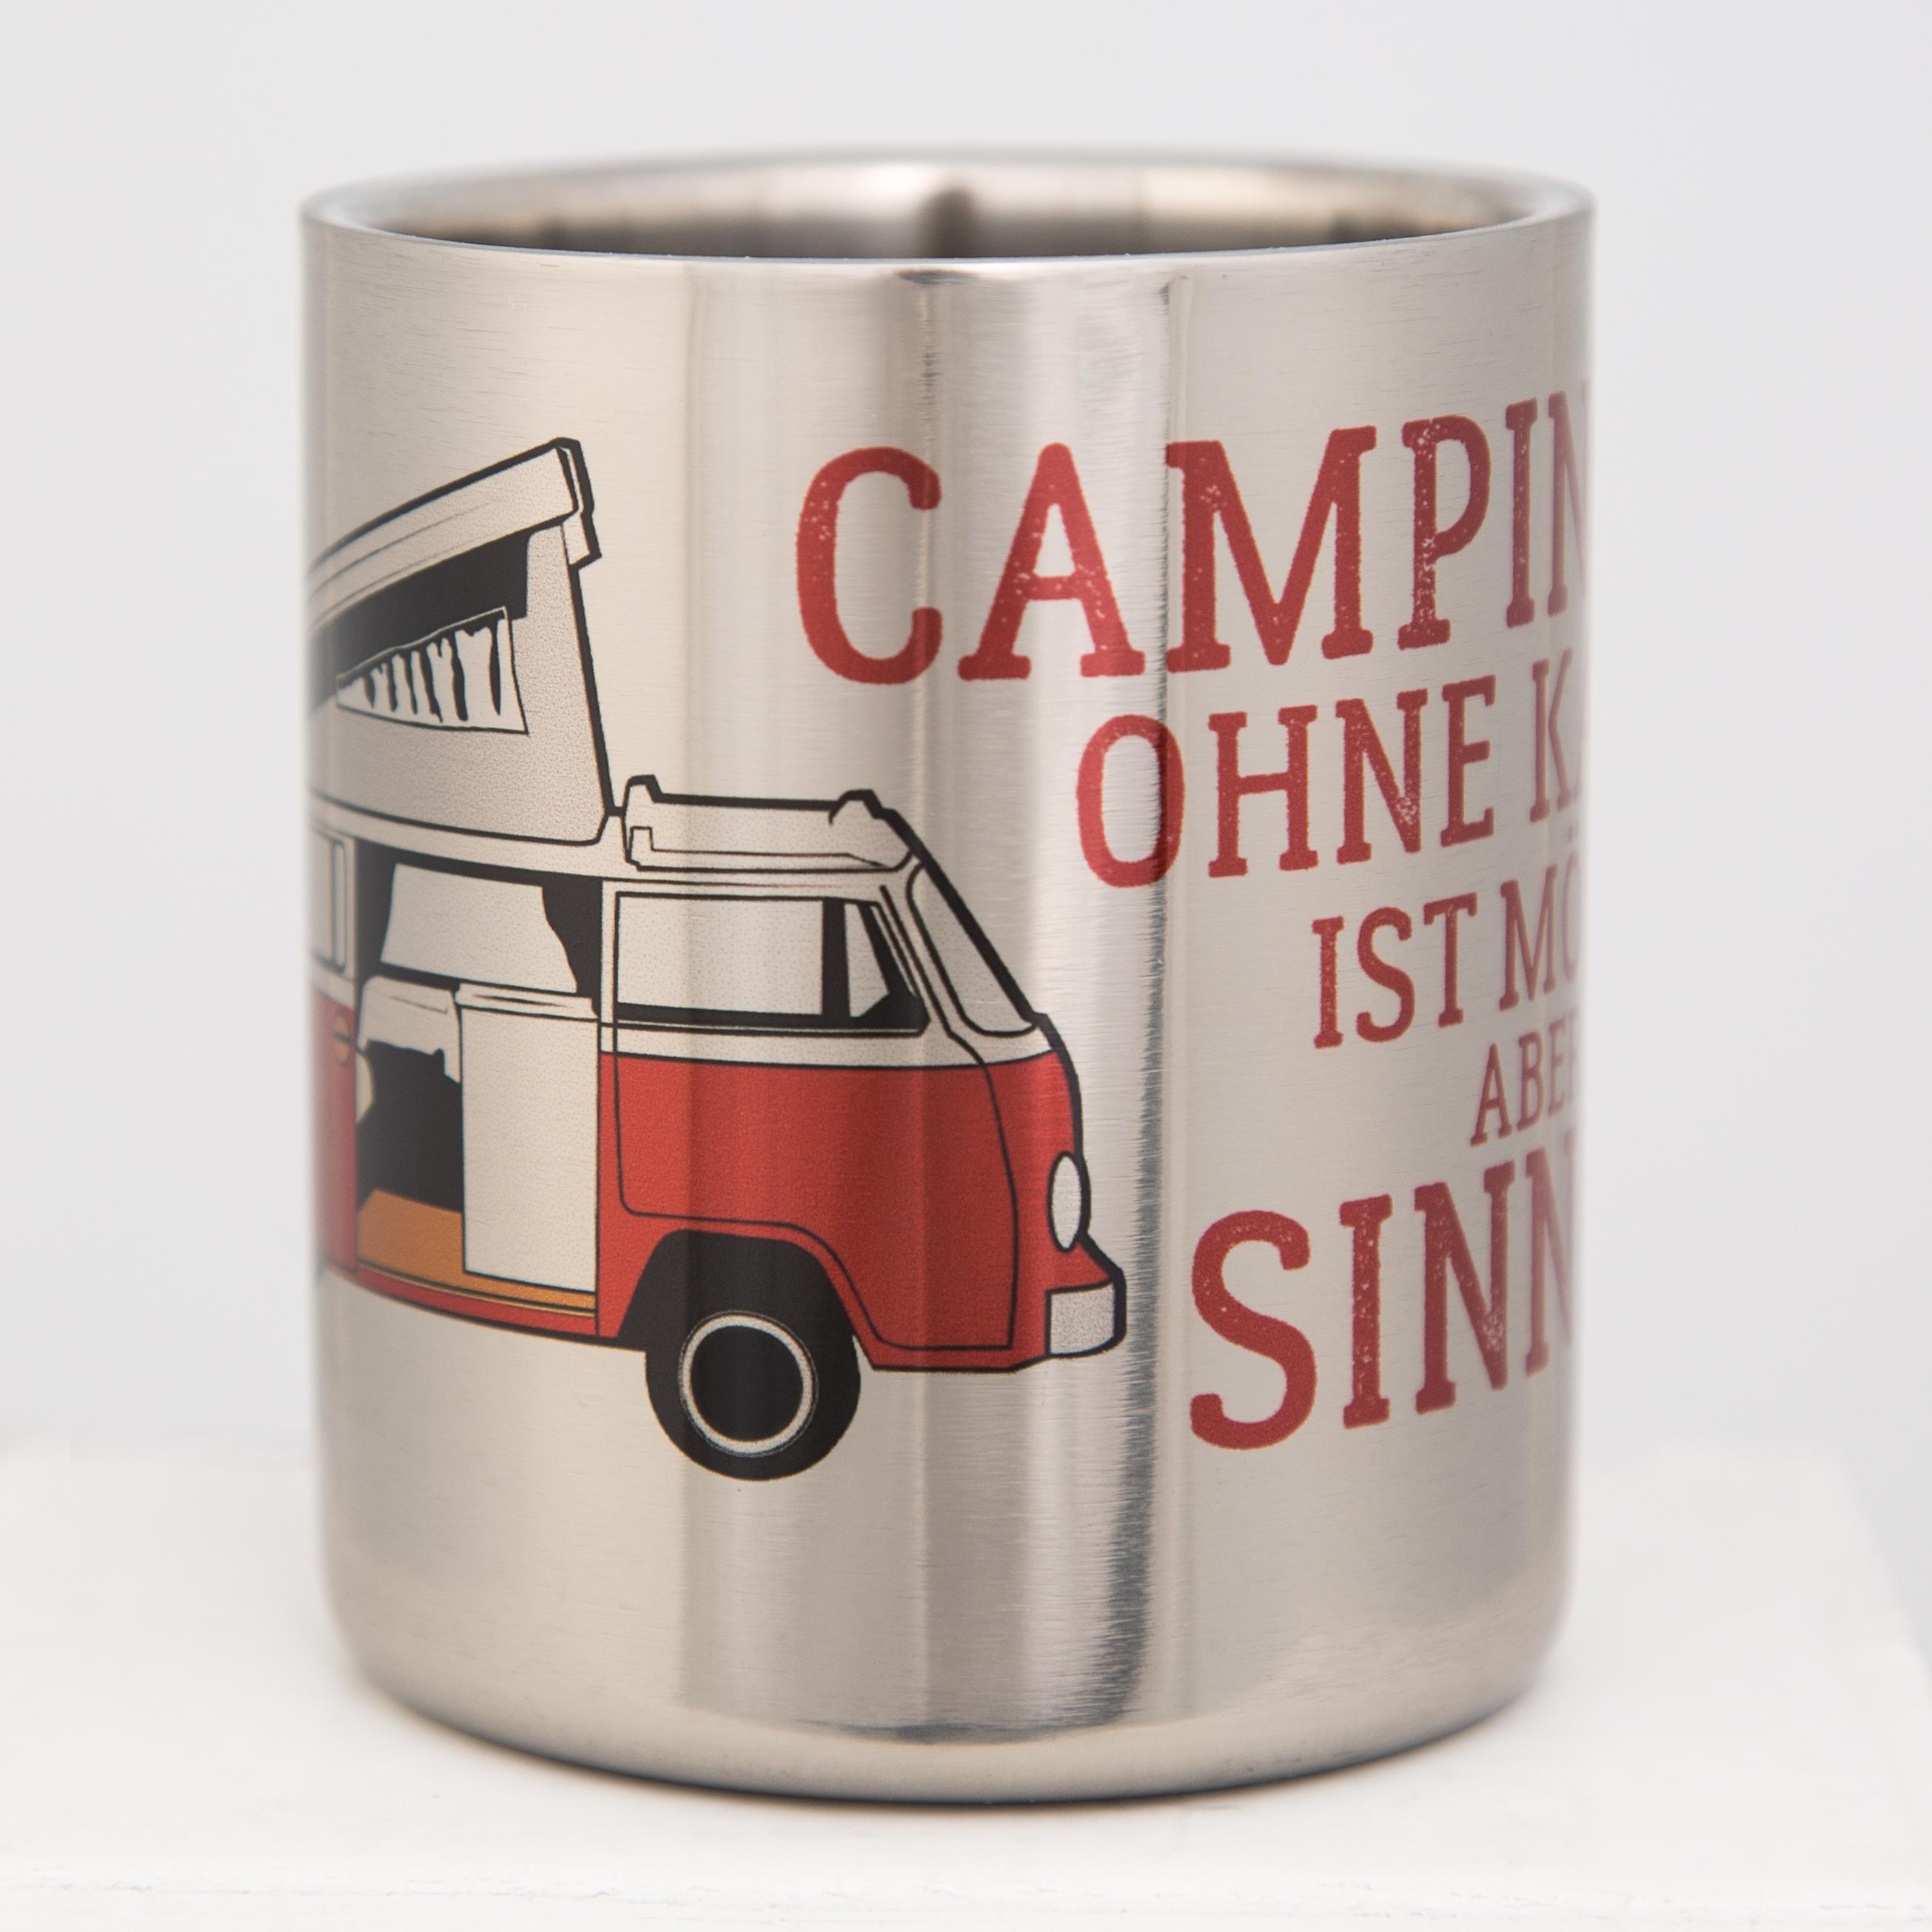 CAMPING OHNE KAFFEE